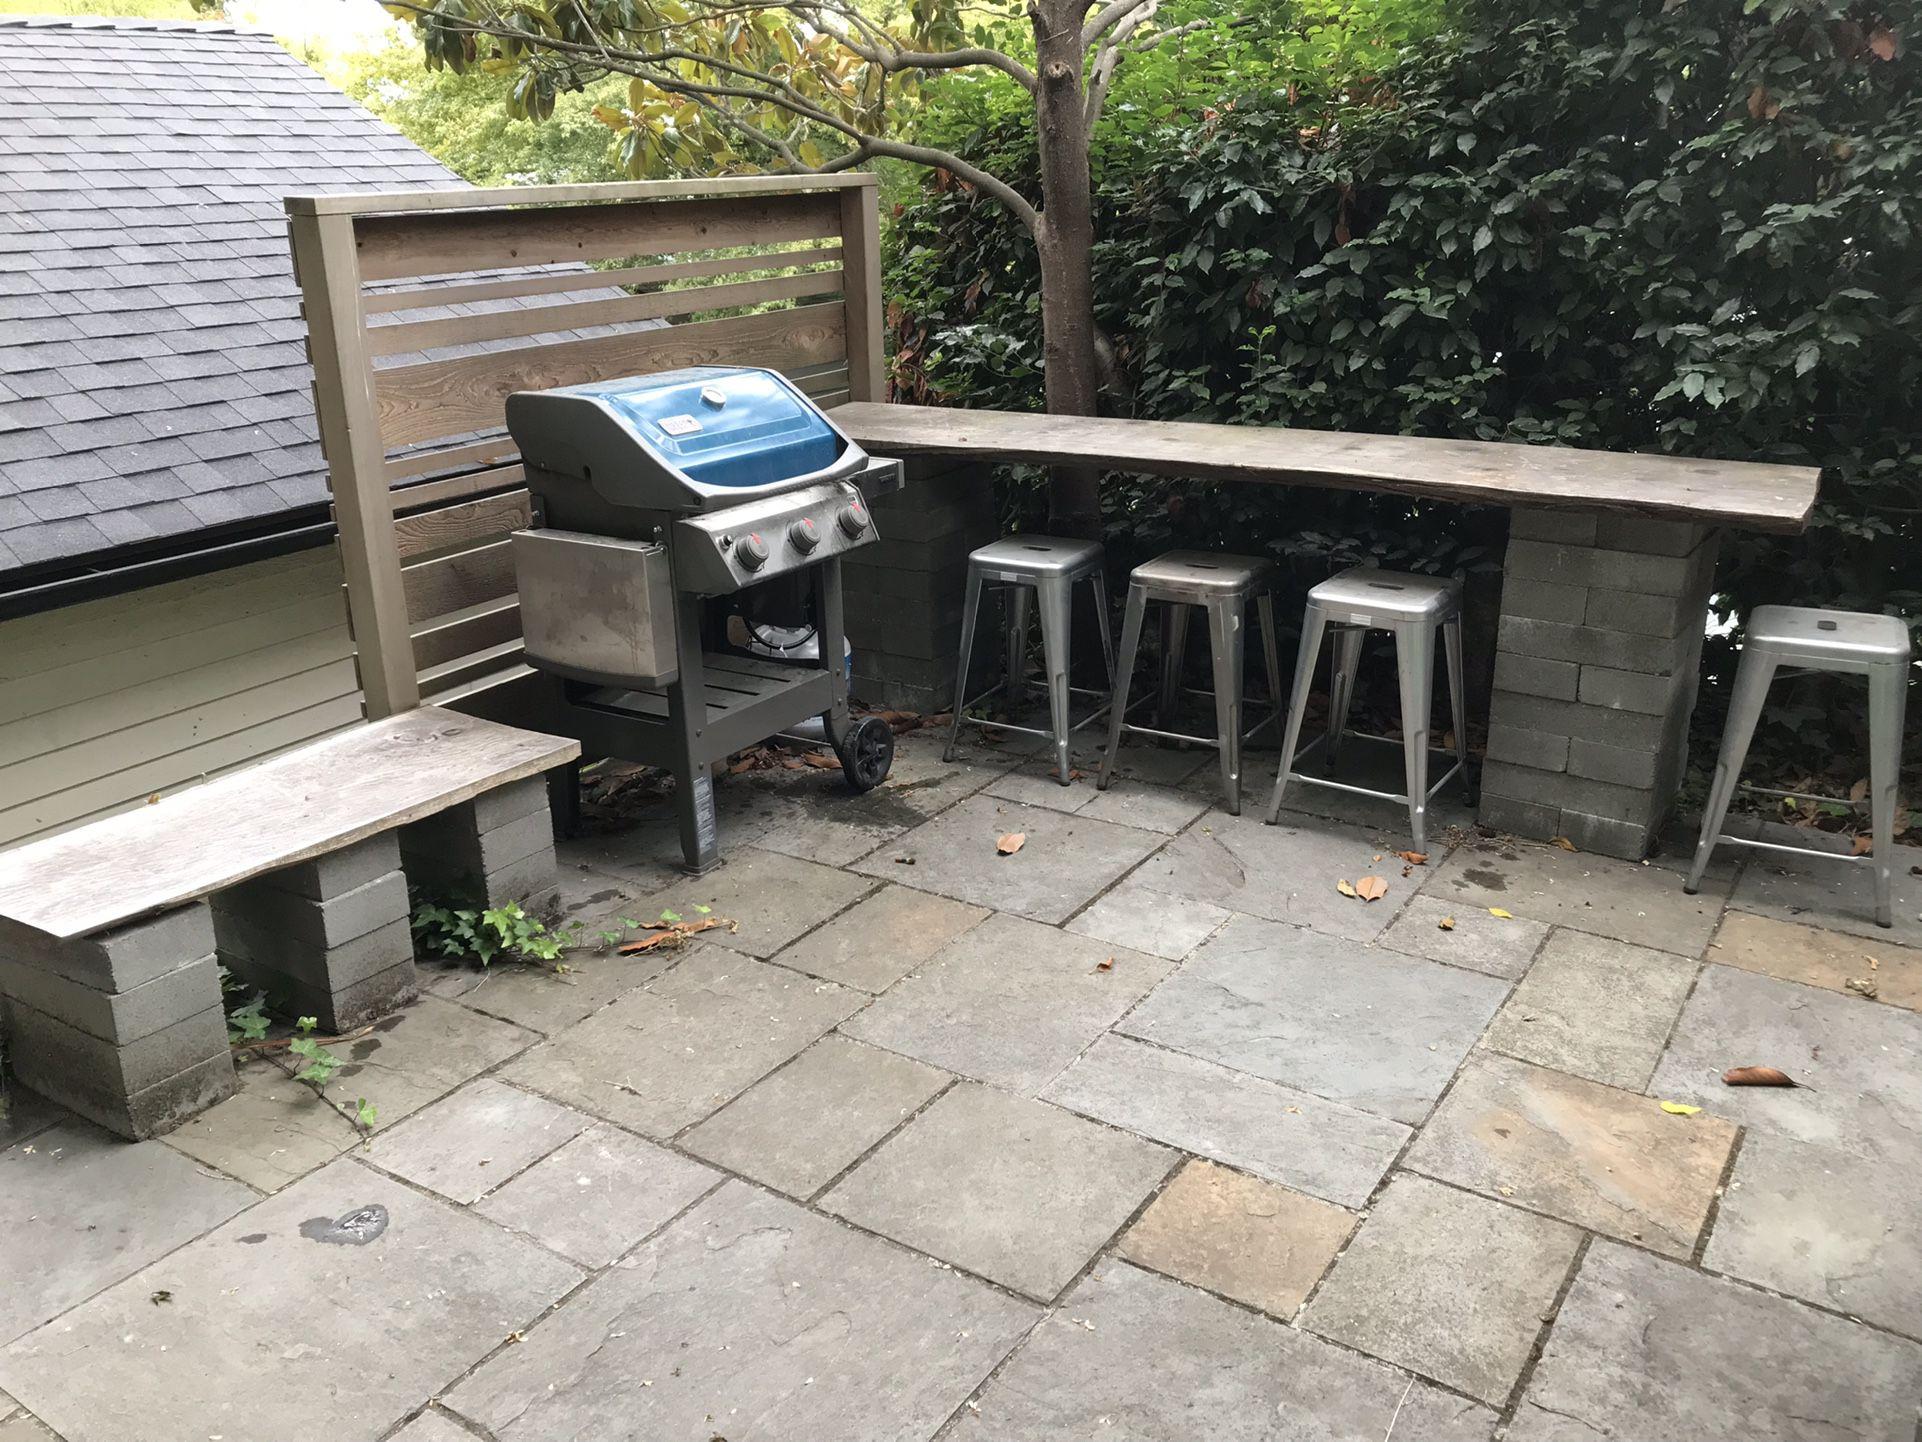 FREE: Two Live Edge Cedar Pieces & Fifty 8x16x4 Concrete Blocks